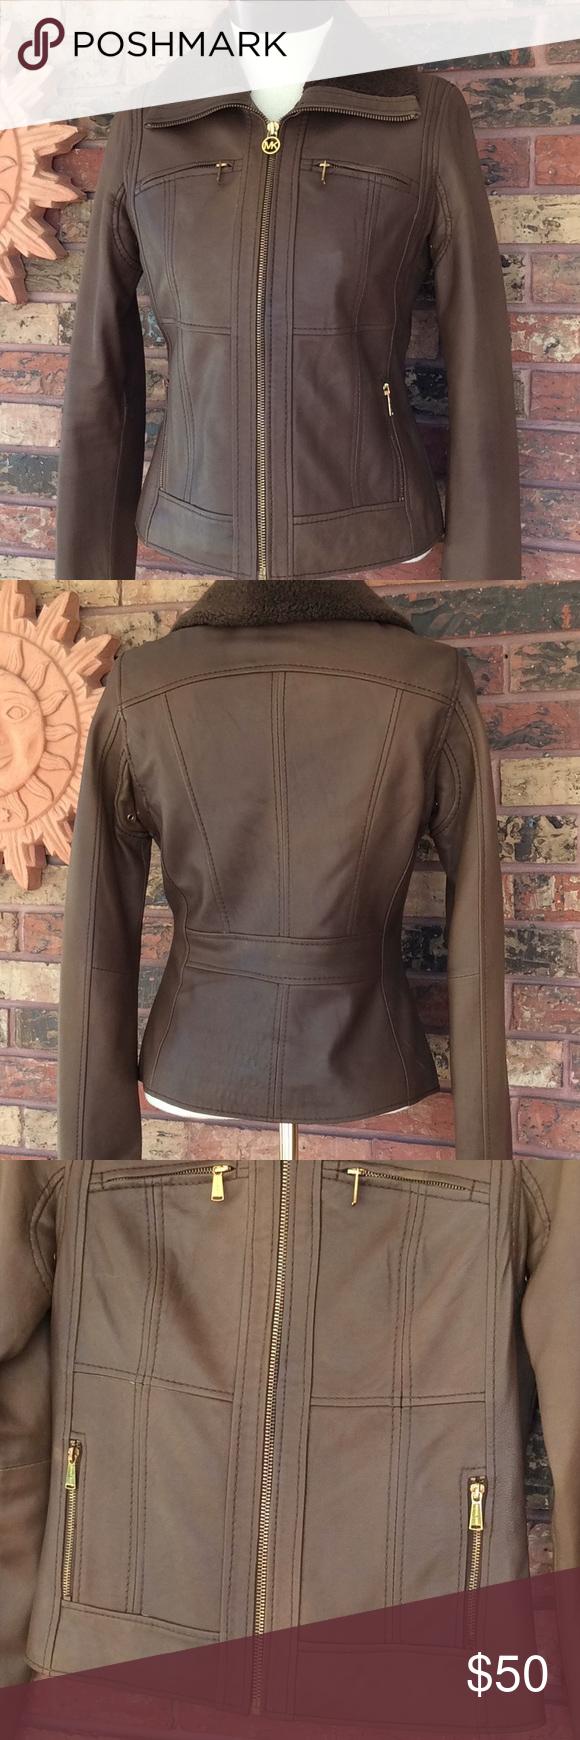 Michael Kors Leather Bomber Jacket S Brown Sherpa Leather Bomber Jacket Leather Bomber Brown Leather Jacket [ 1740 x 580 Pixel ]